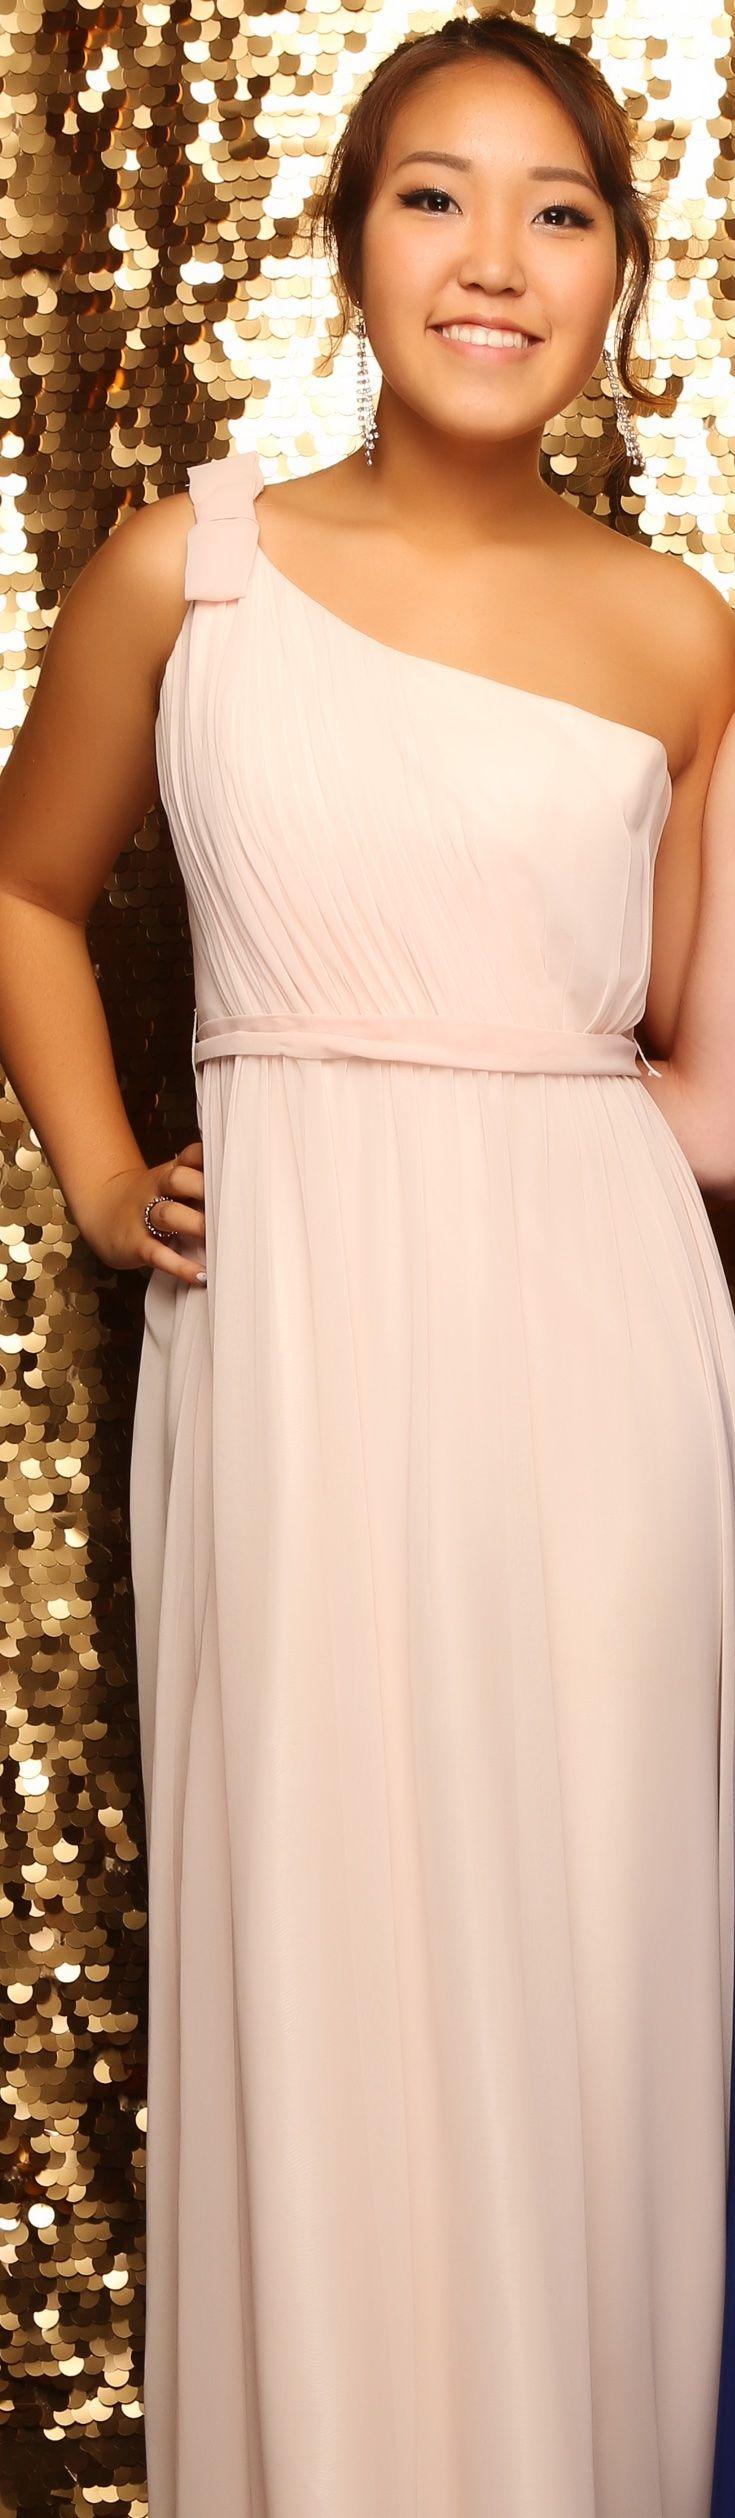 KingsWay Ball 2016. Love this pastel look! www.whitedoor.co.nz